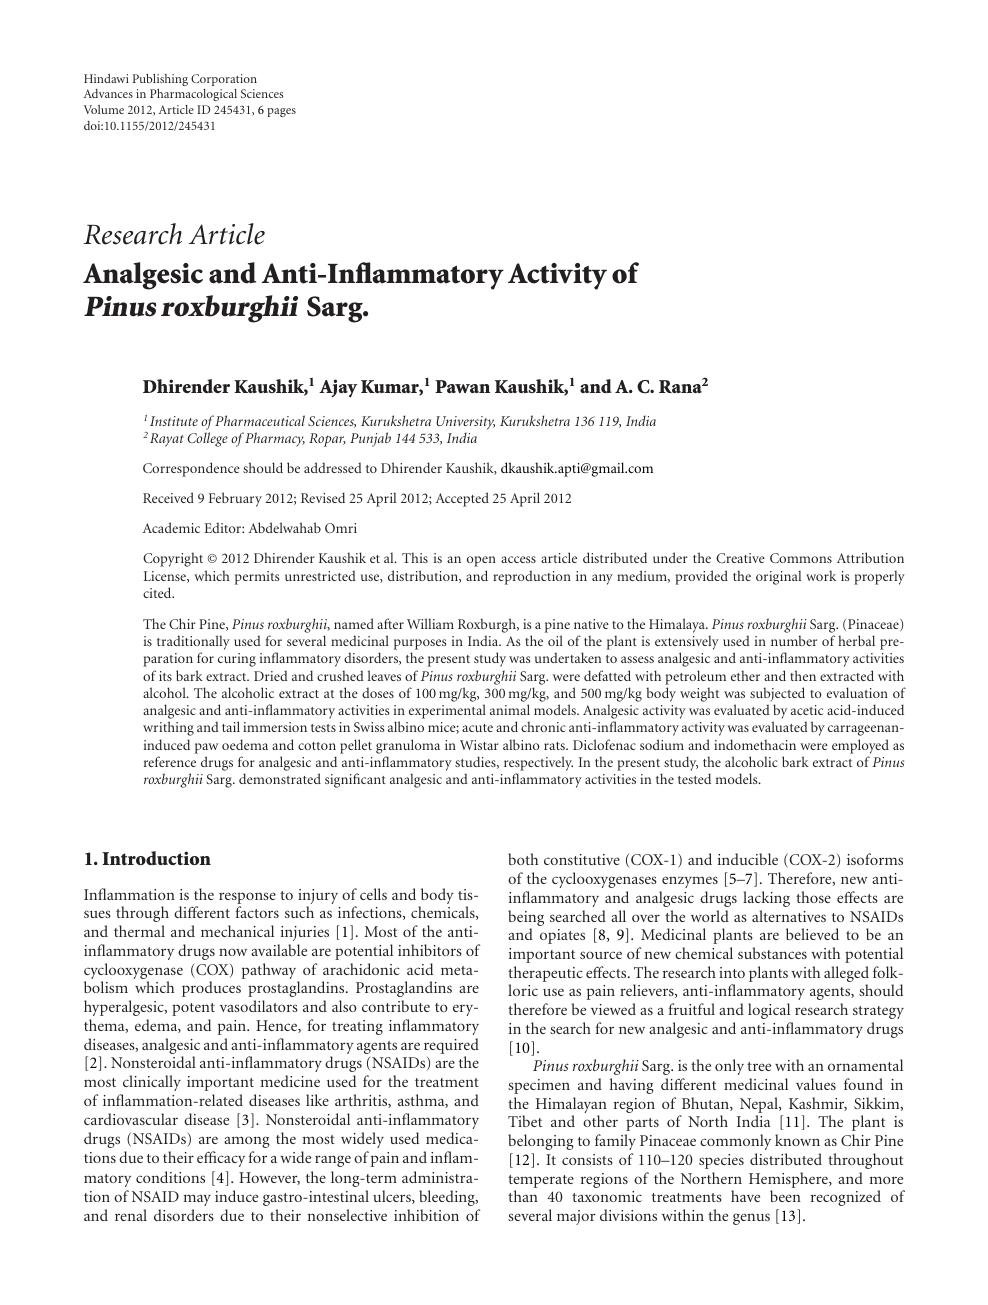 anthelmintic meaning in punjabi vaccino papilloma virus durata copertura